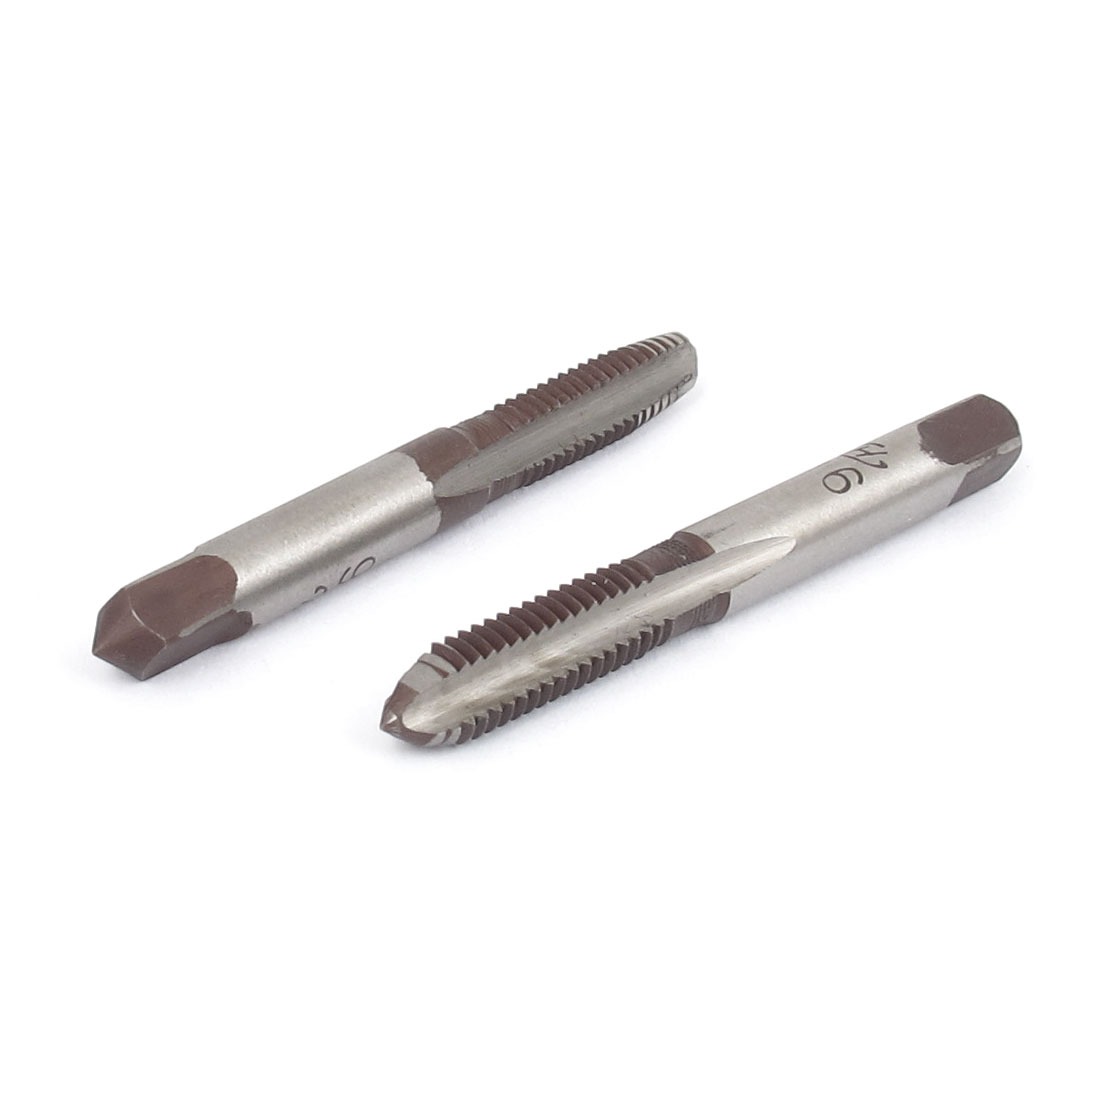 2pcs M6 6mm 3 Flutes High Speed Steel HSS Hand Screw Thread Metric Plug Taps